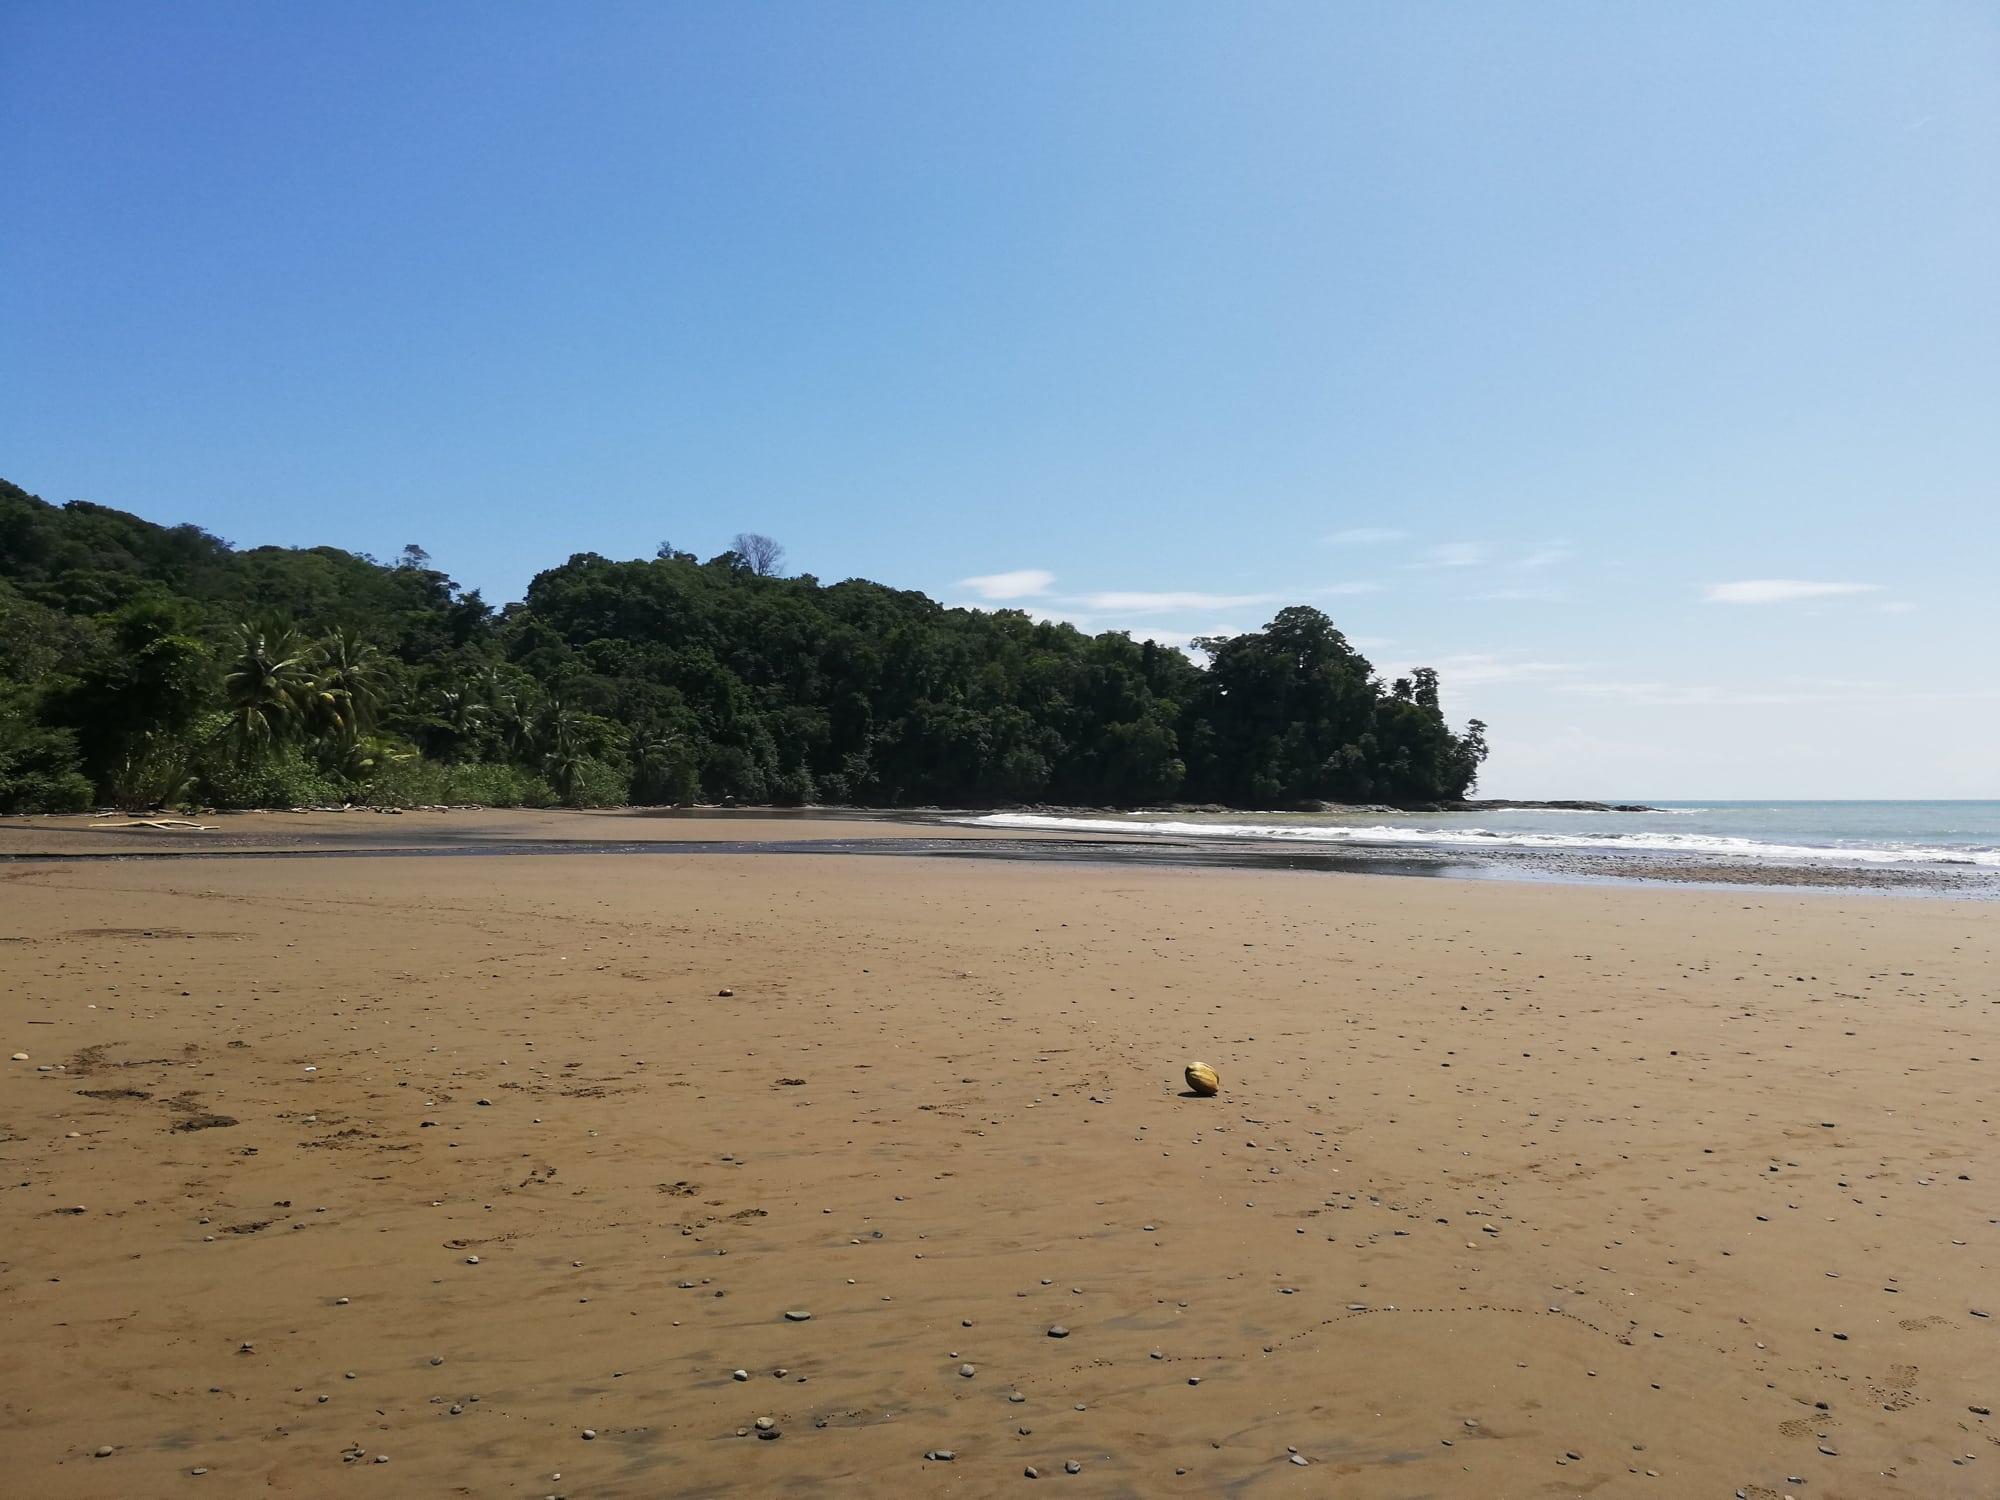 Playa Ballena South Pacific Costa Riva Beaches 2